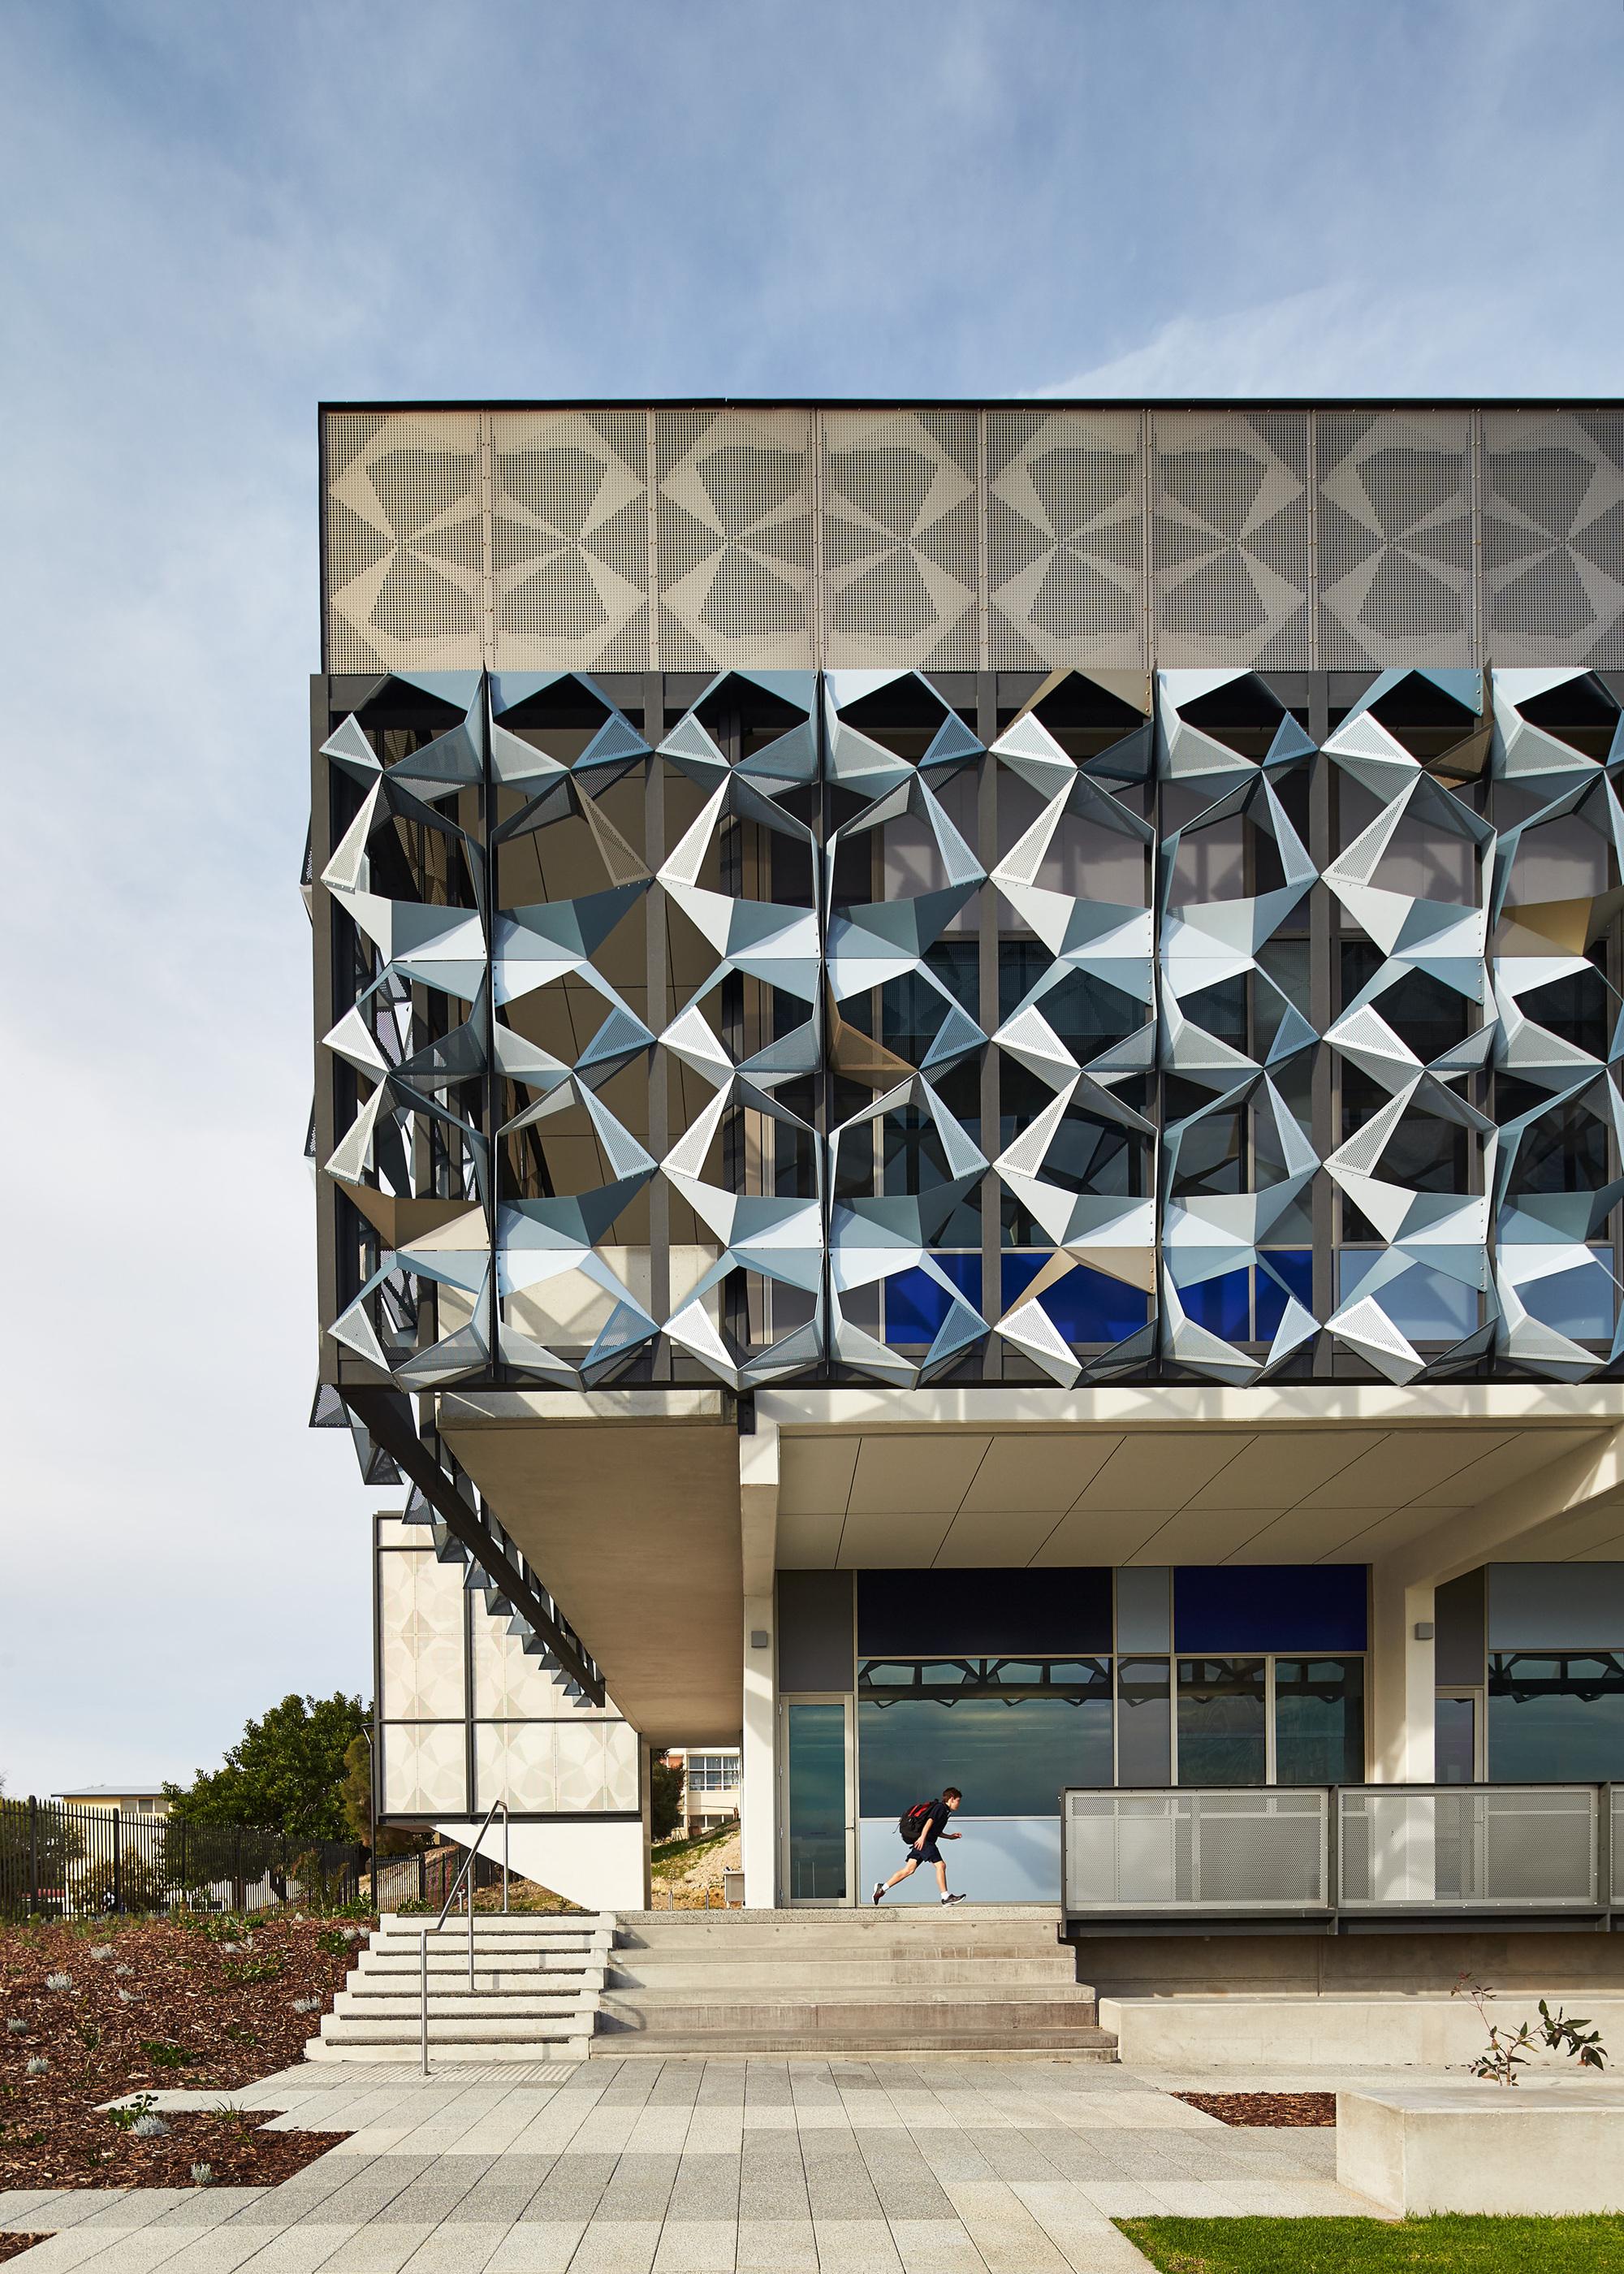 John Curtin College Arts Jcy Architects And Urban Designers - 14